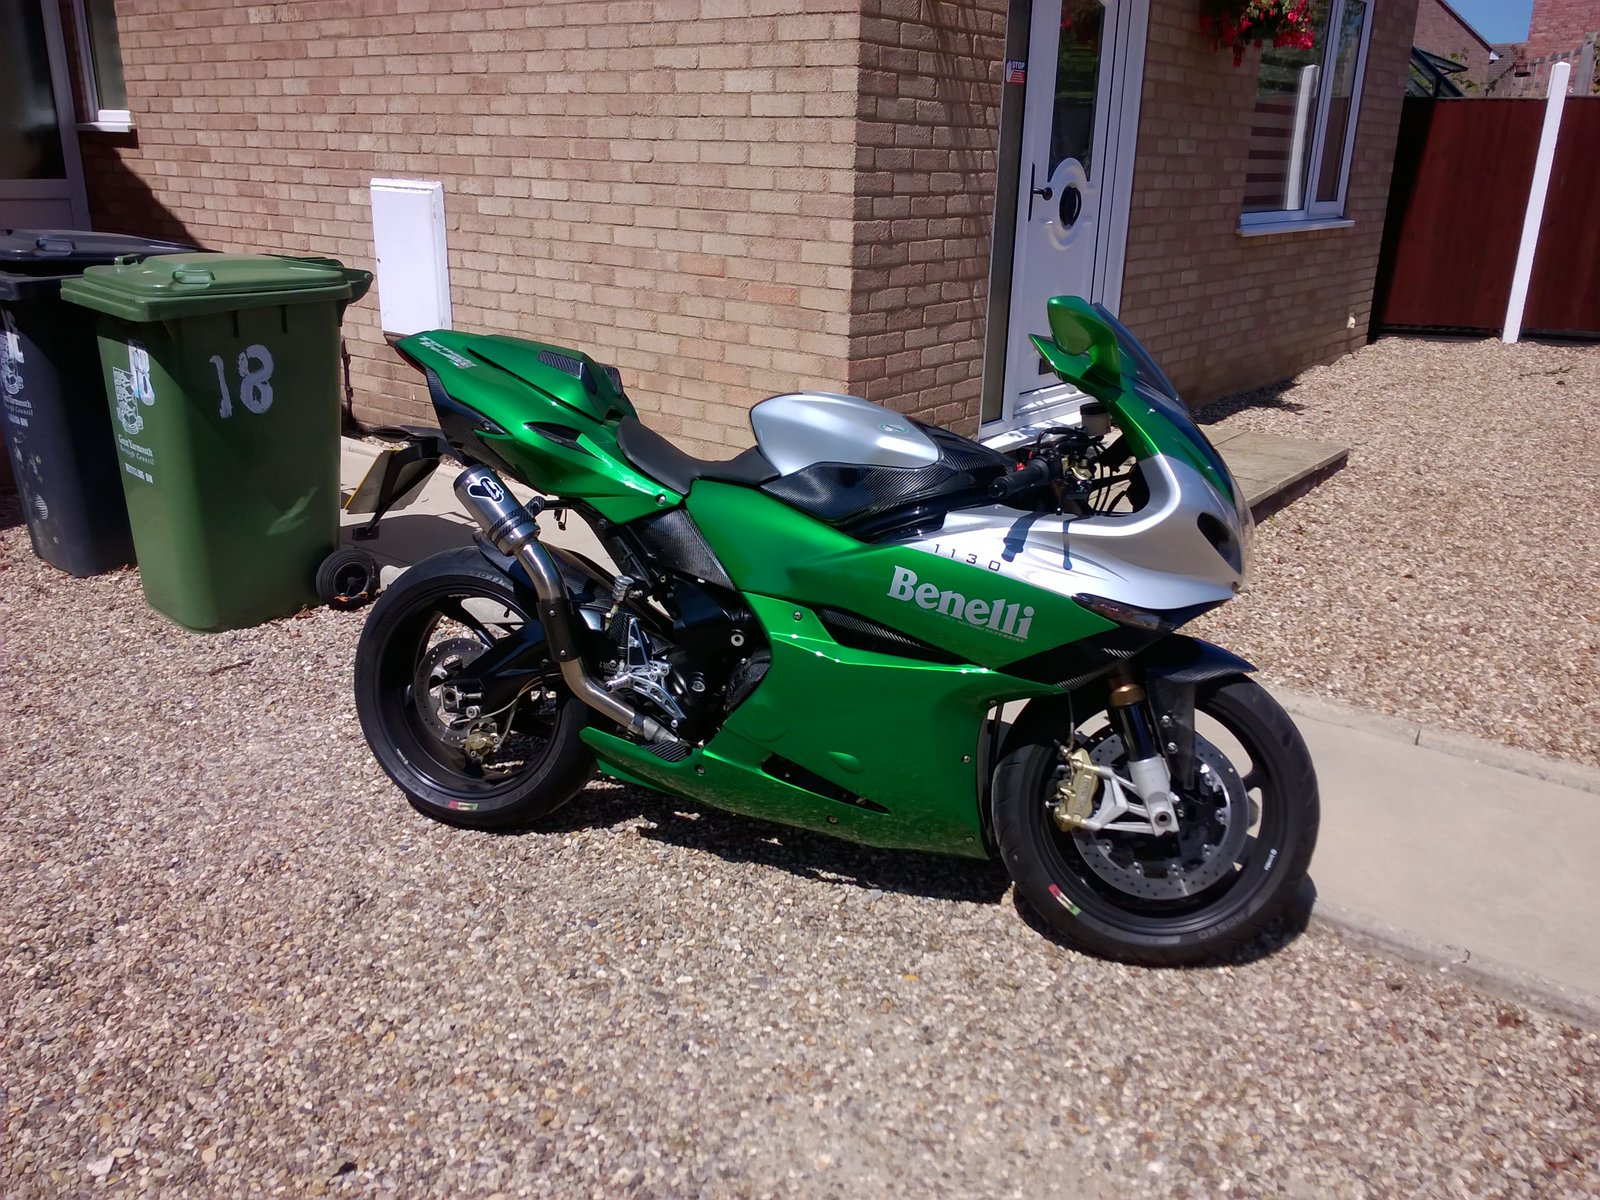 Benelli Tornado Naked Tre 1130 [2] wallpaper - Motorcycle